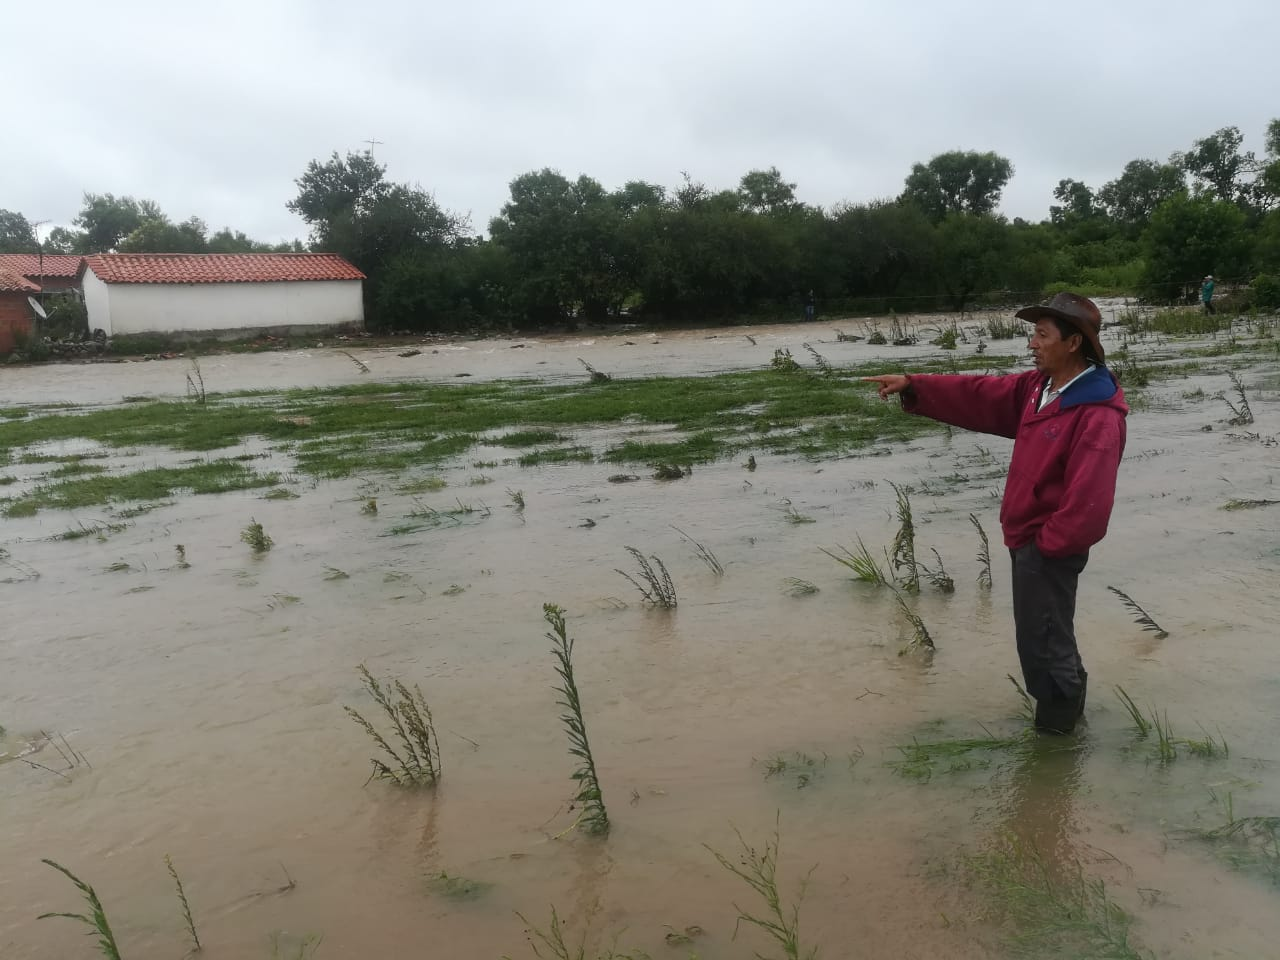 El desborde del río en San Andrés cercó a varias familias